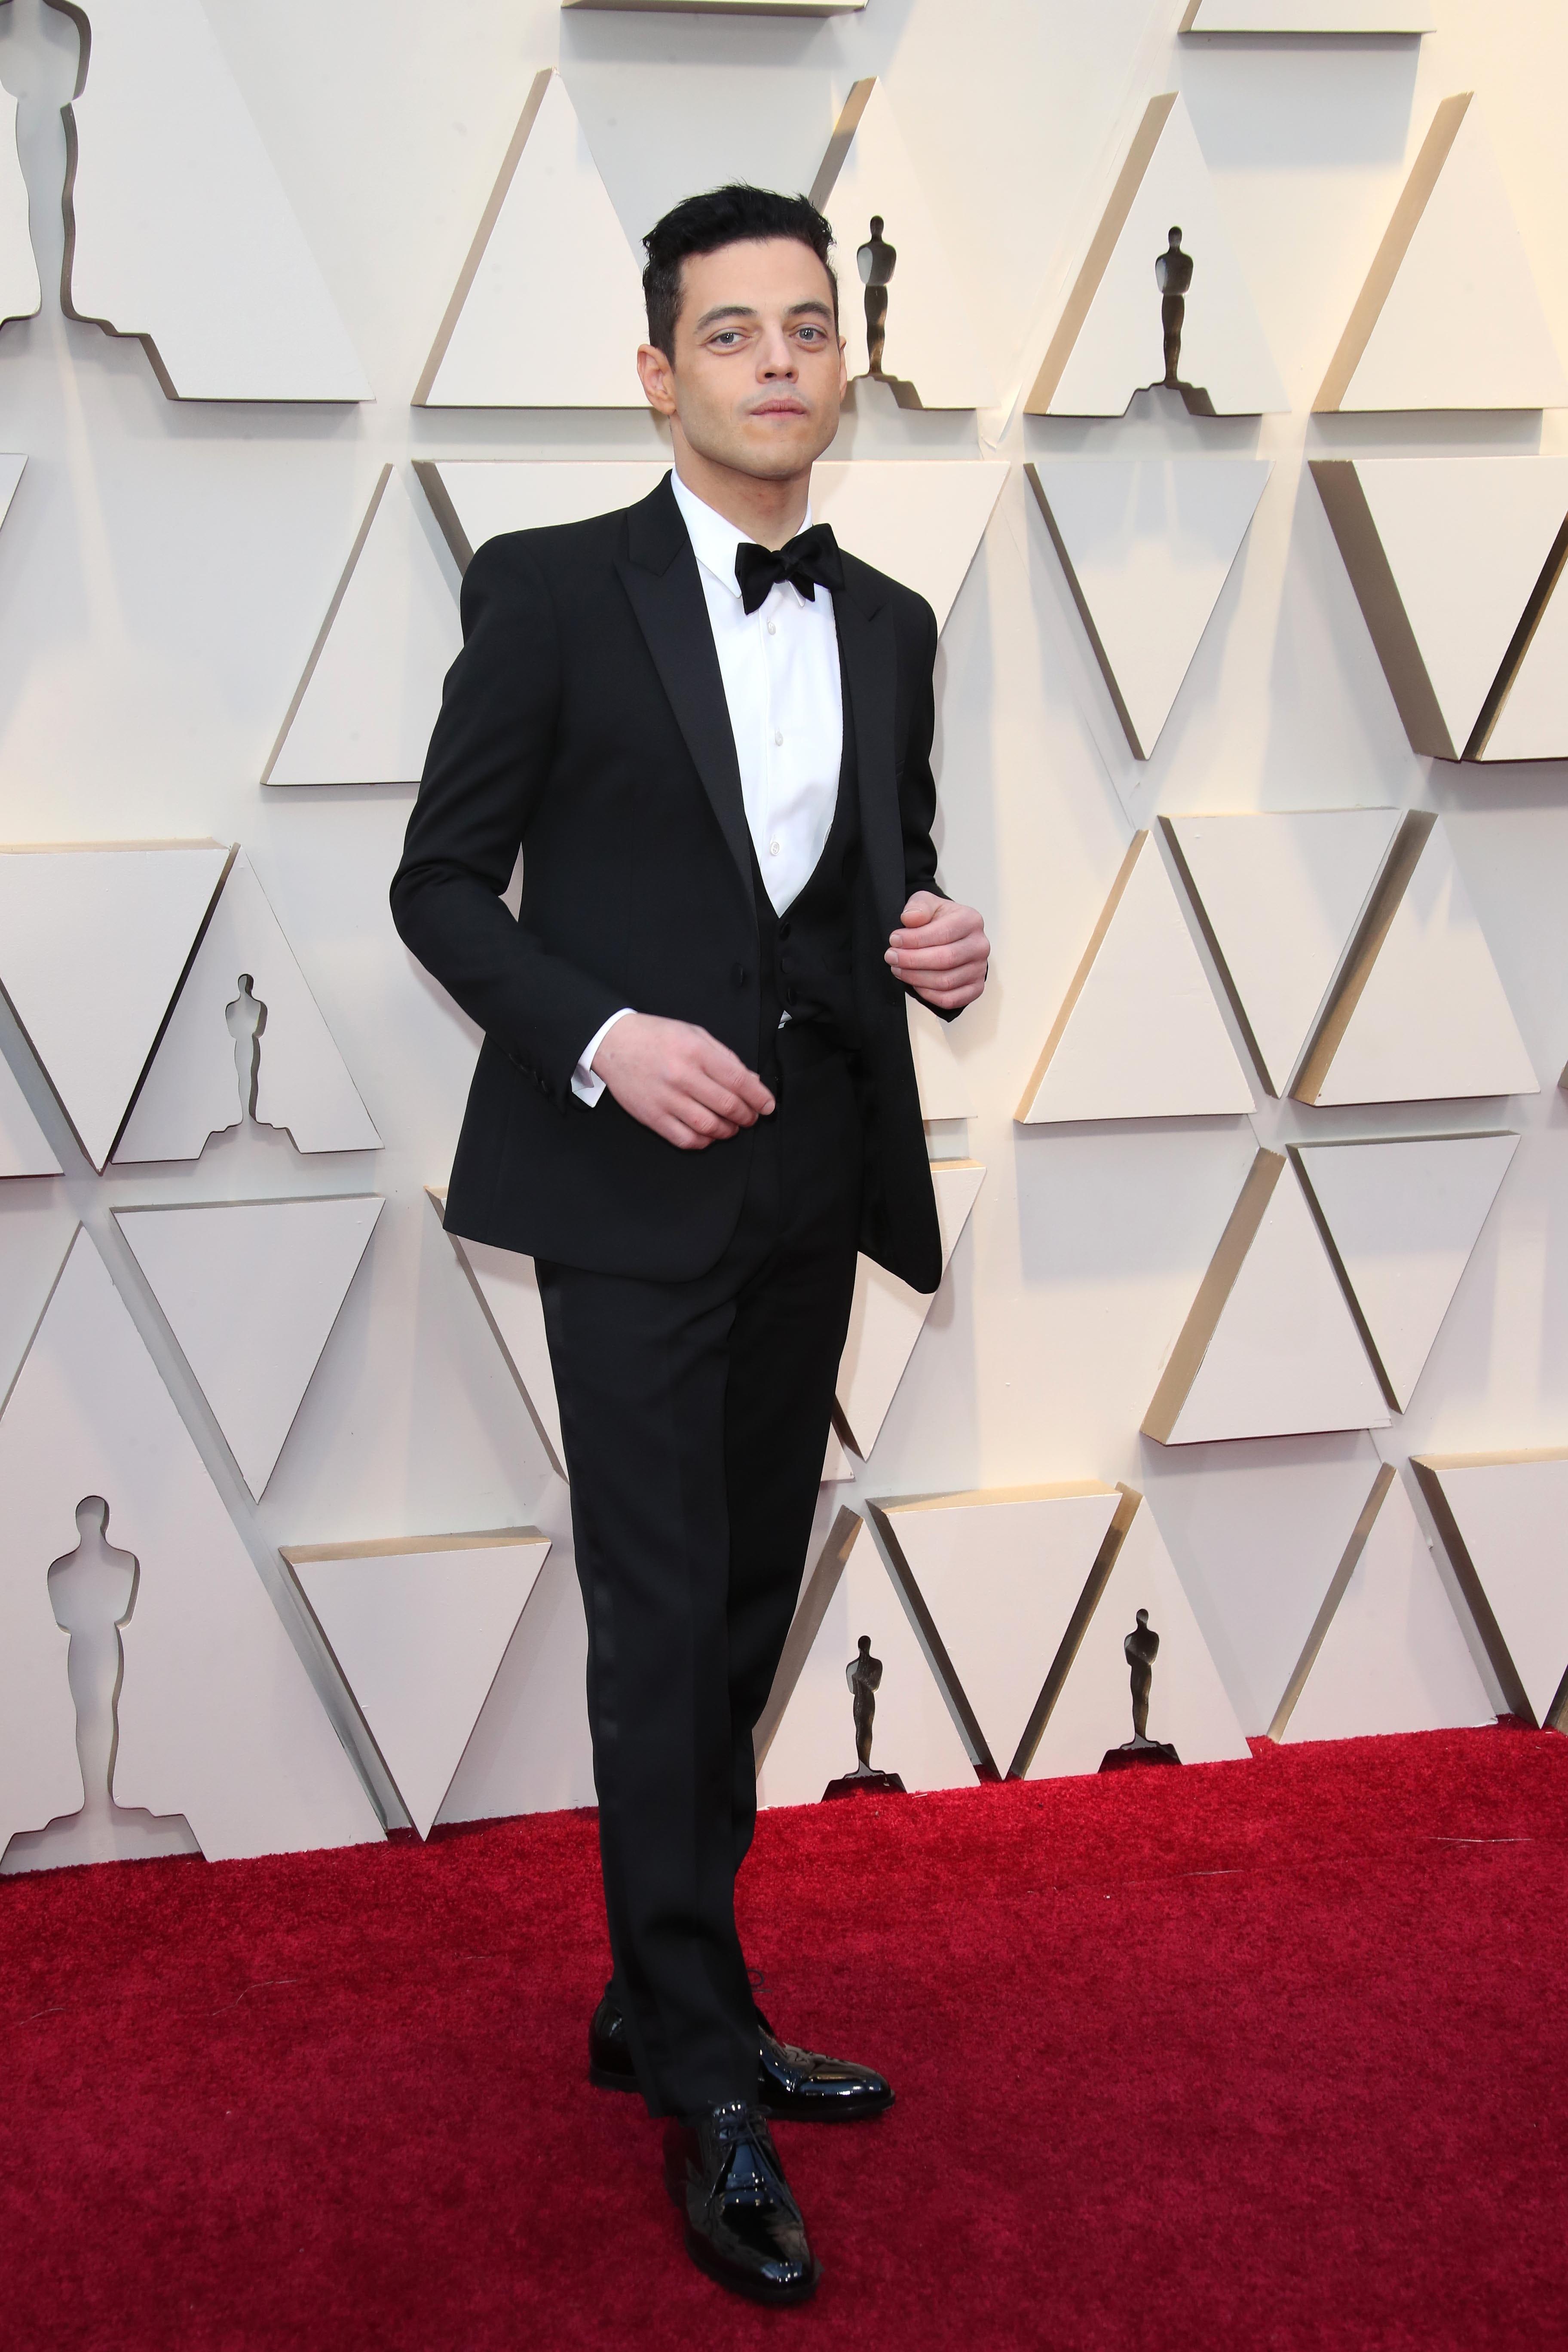 February 24, 2019; Los Angeles, CA, USA; Rami Malek arrives at the 91st Academy Awards at the Dolby Theatre. Mandatory Credit: Dan MacMedan-USA TODAY NETWORK